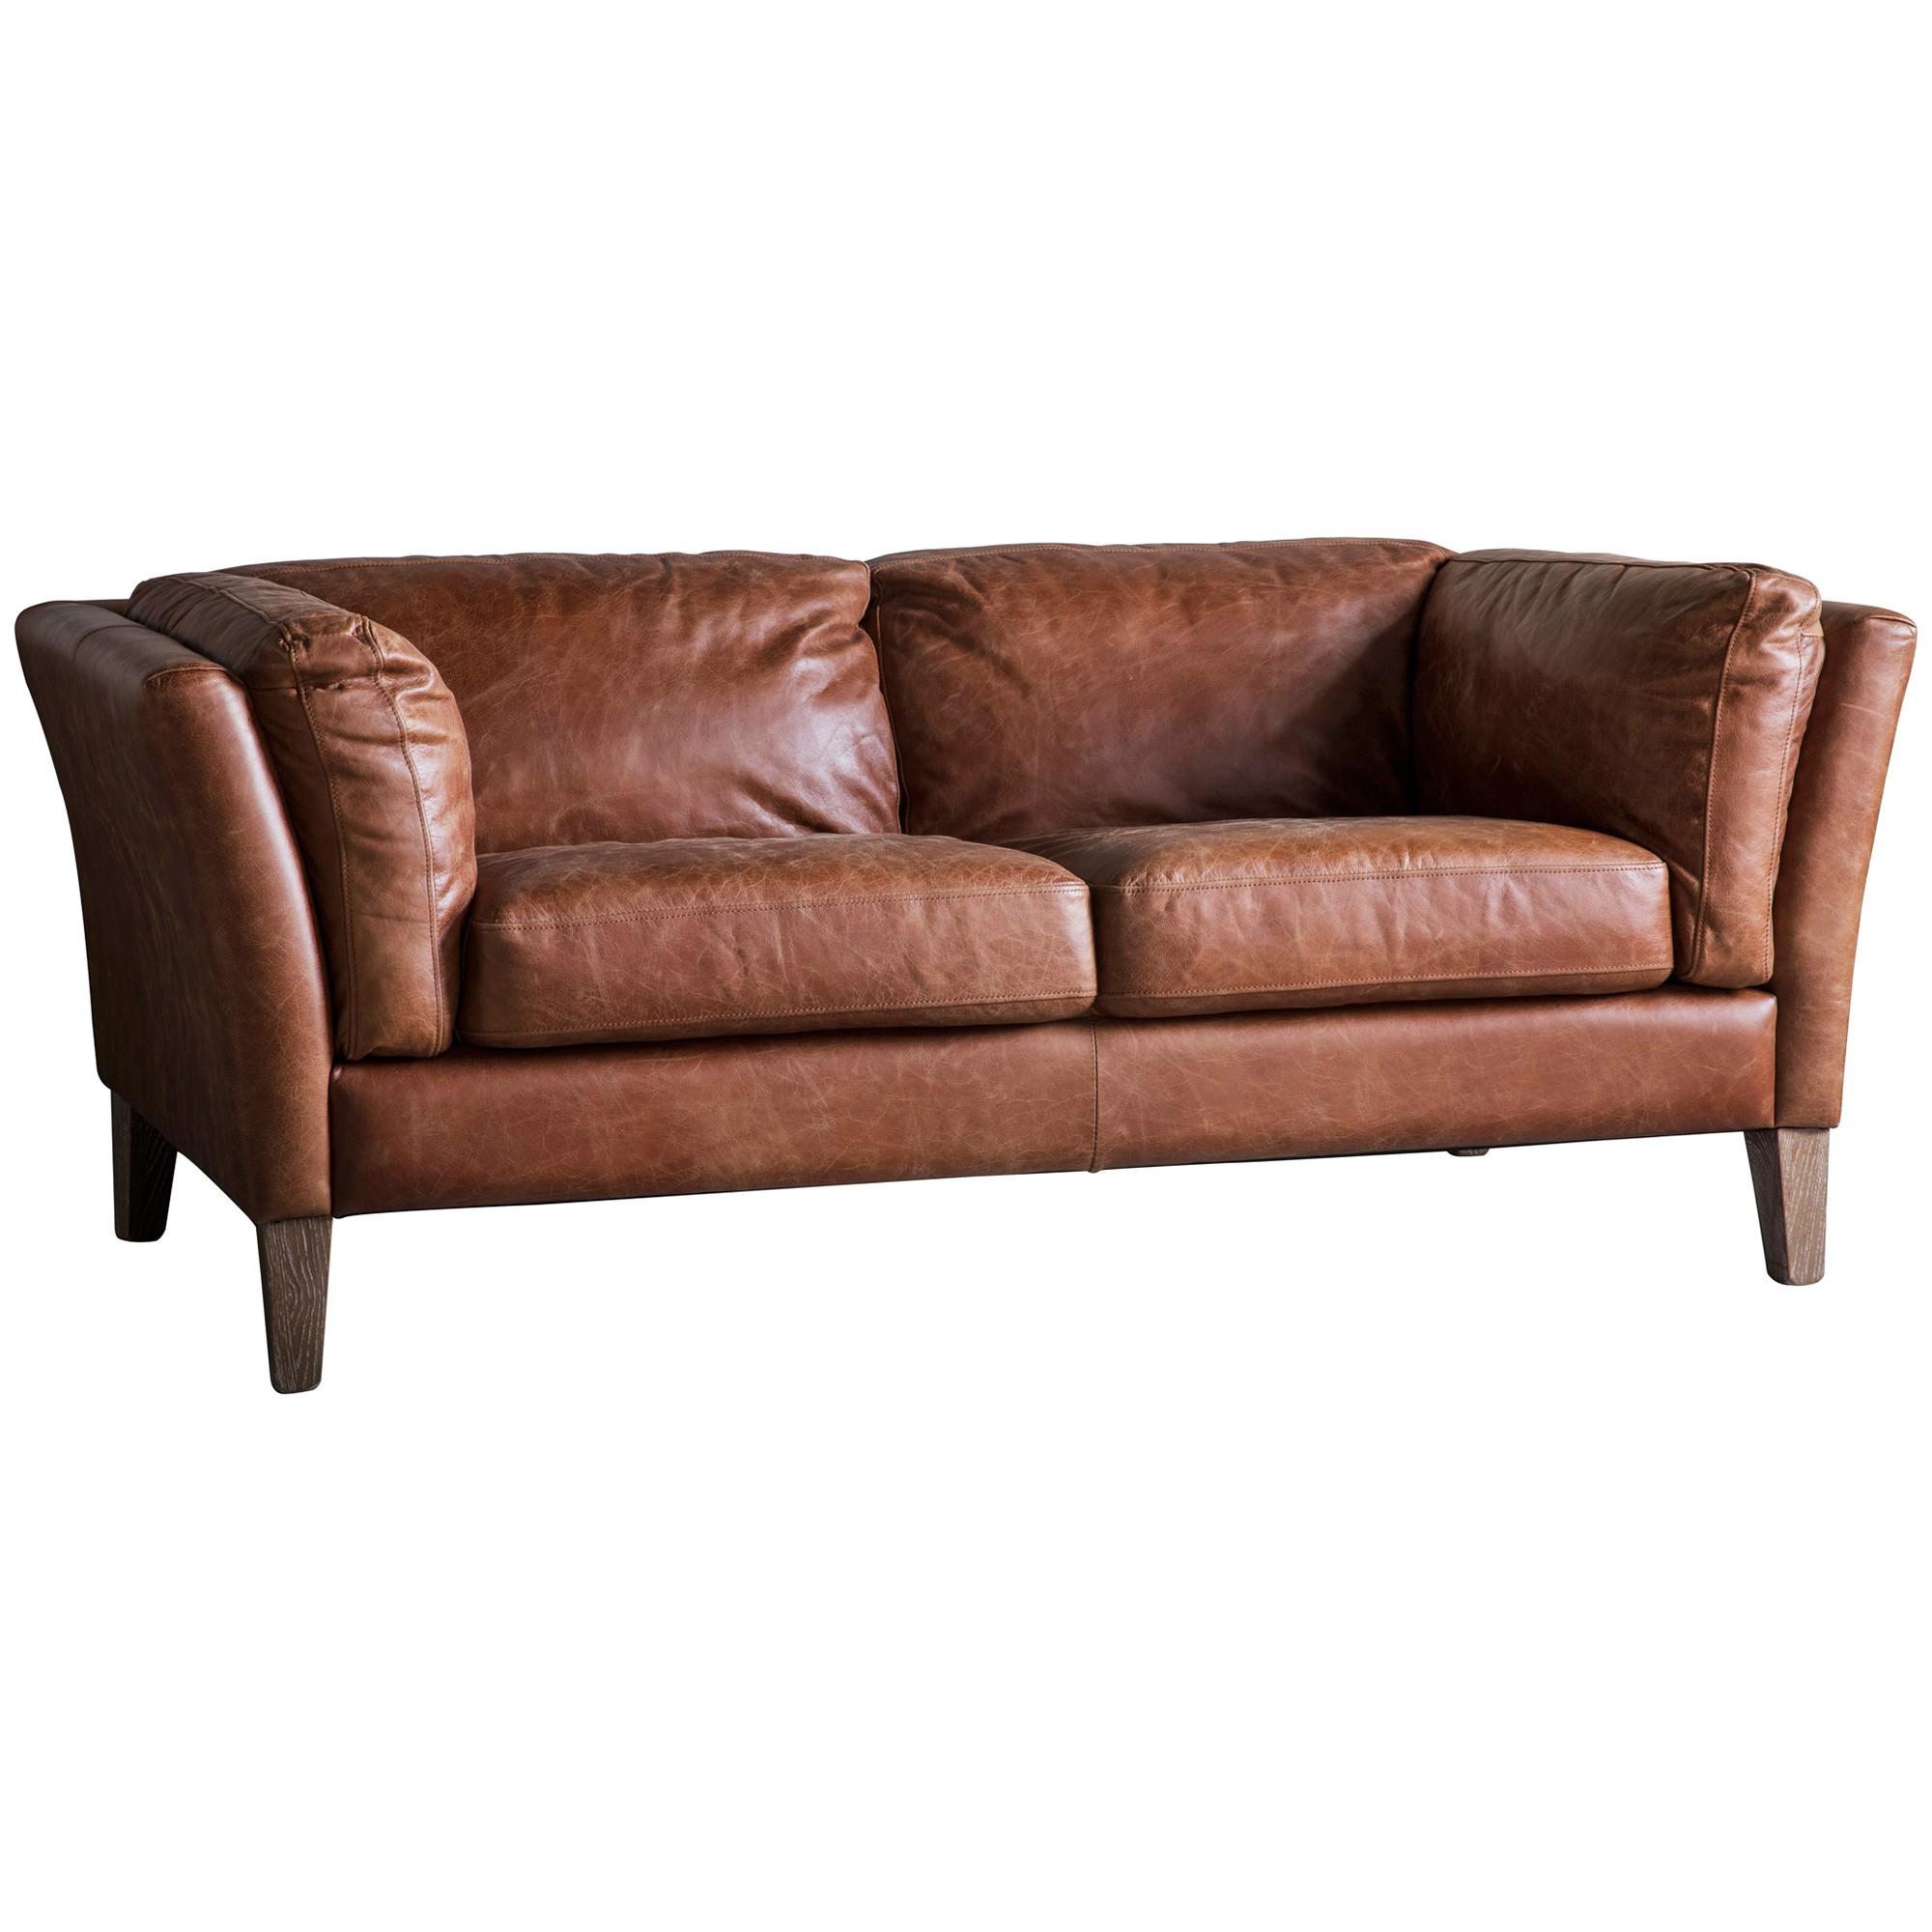 Ebury Vintage Leather 2 Seater Sofa